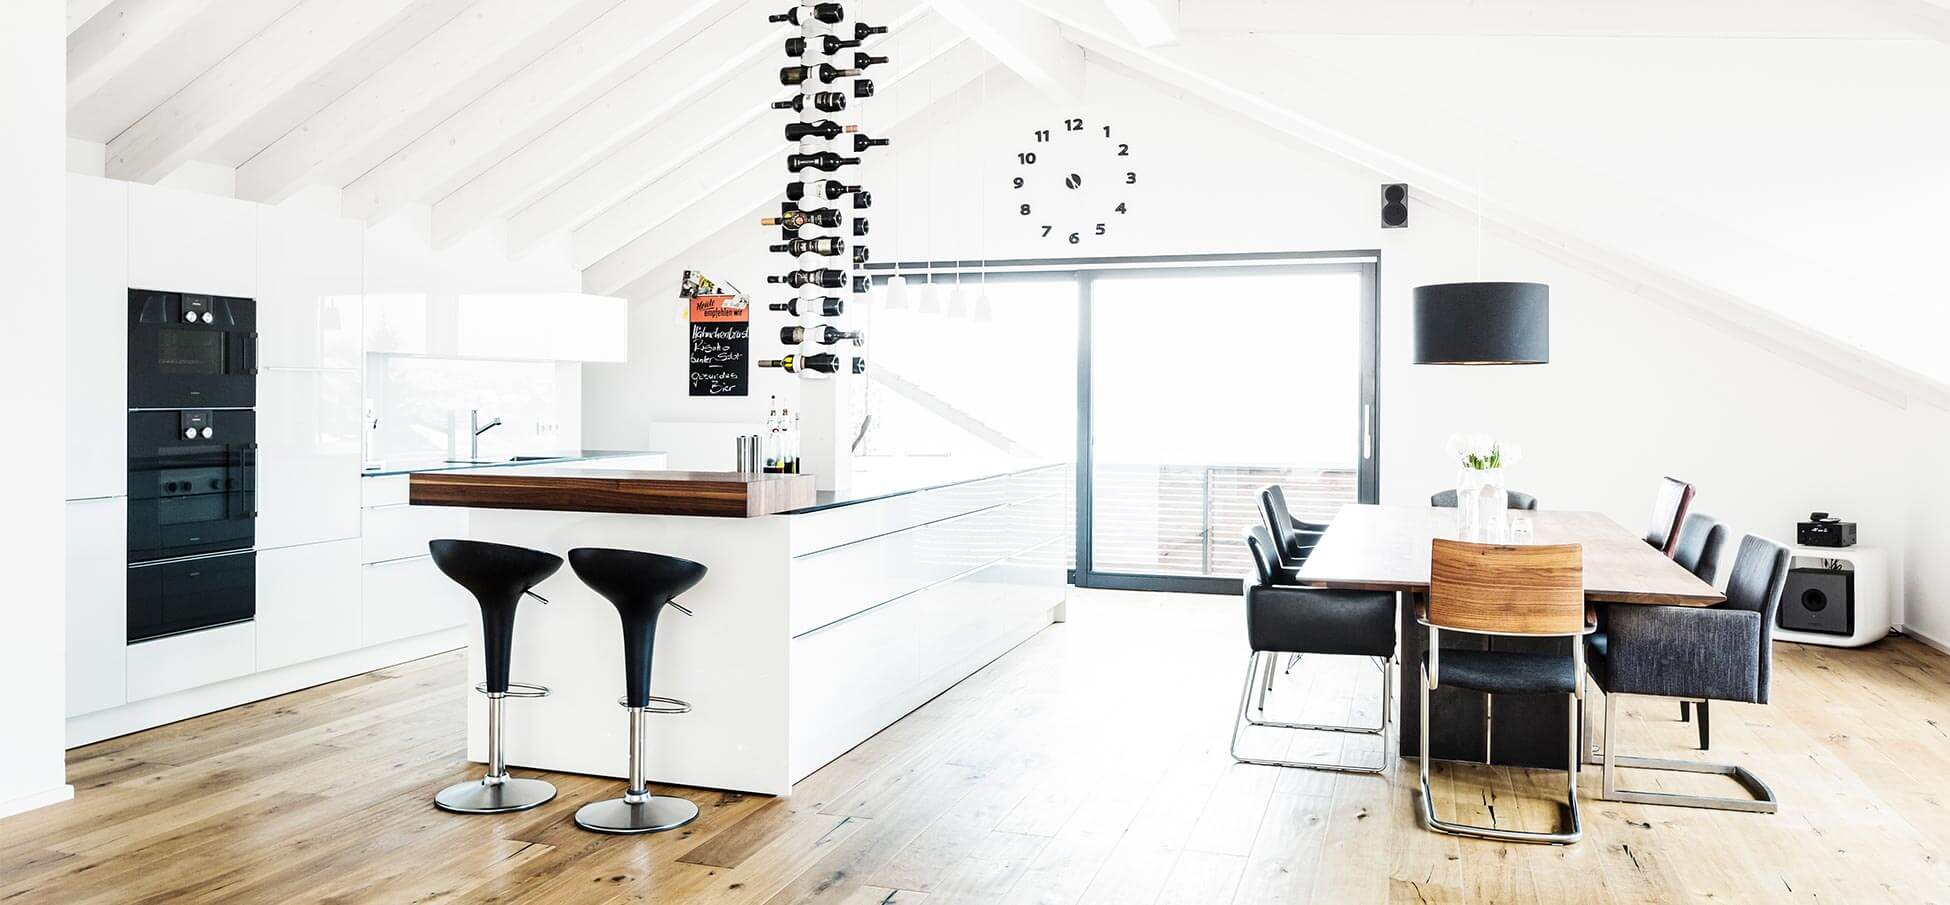 kchenstudio duisburg affordable cheap tools with kchen mannheim with kchenstudio duisburg. Black Bedroom Furniture Sets. Home Design Ideas